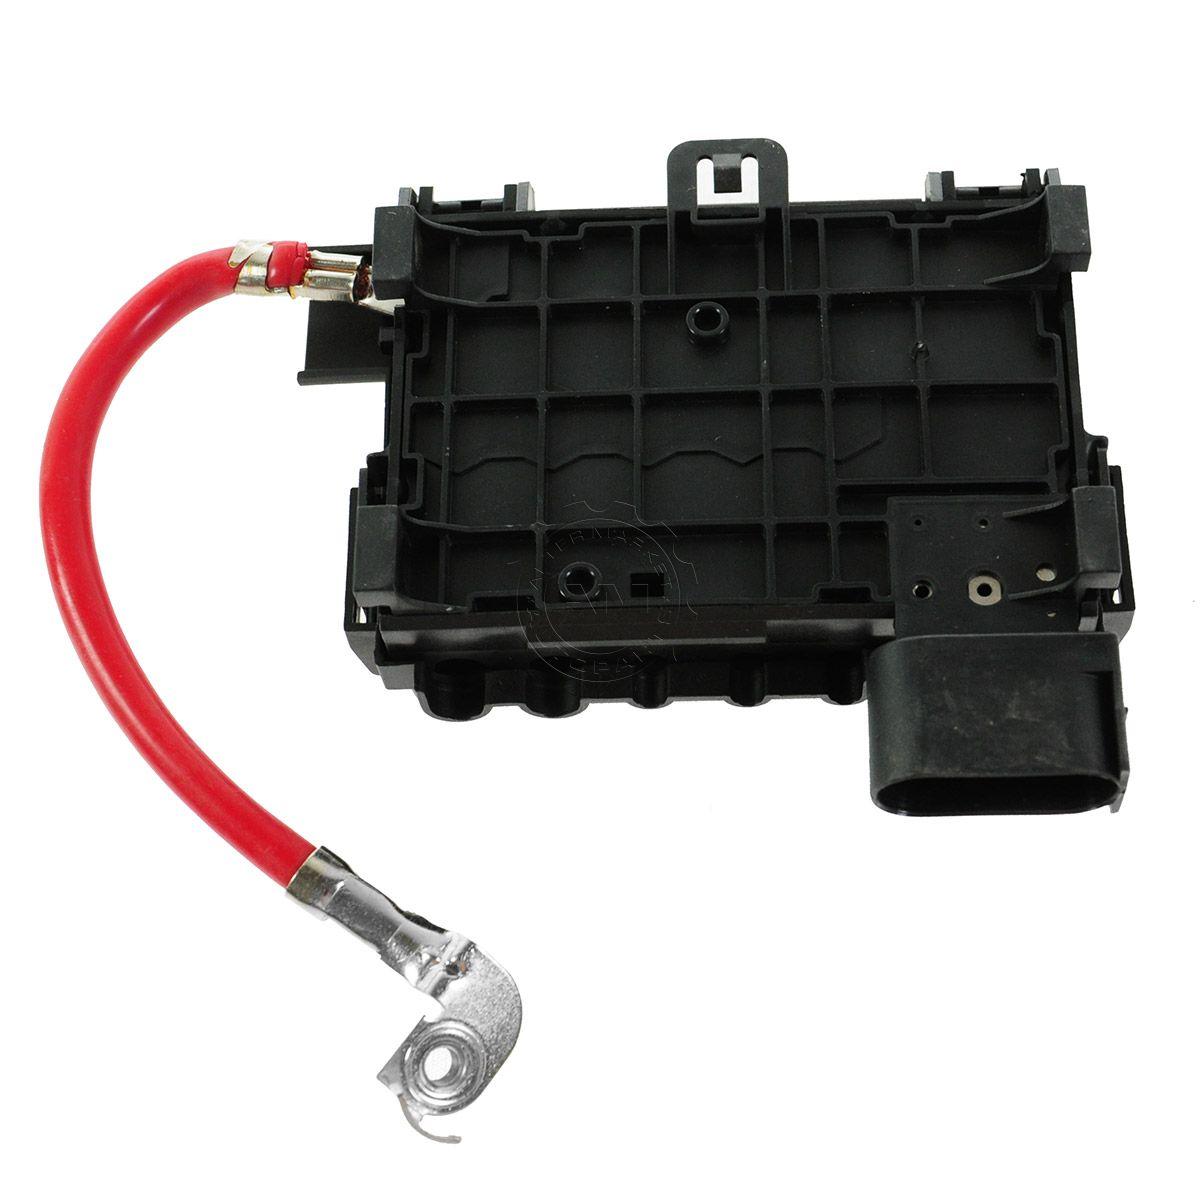 Power Distribution Fuse Block Box for VW Volkswagen Beetle Golf Jetta Eos